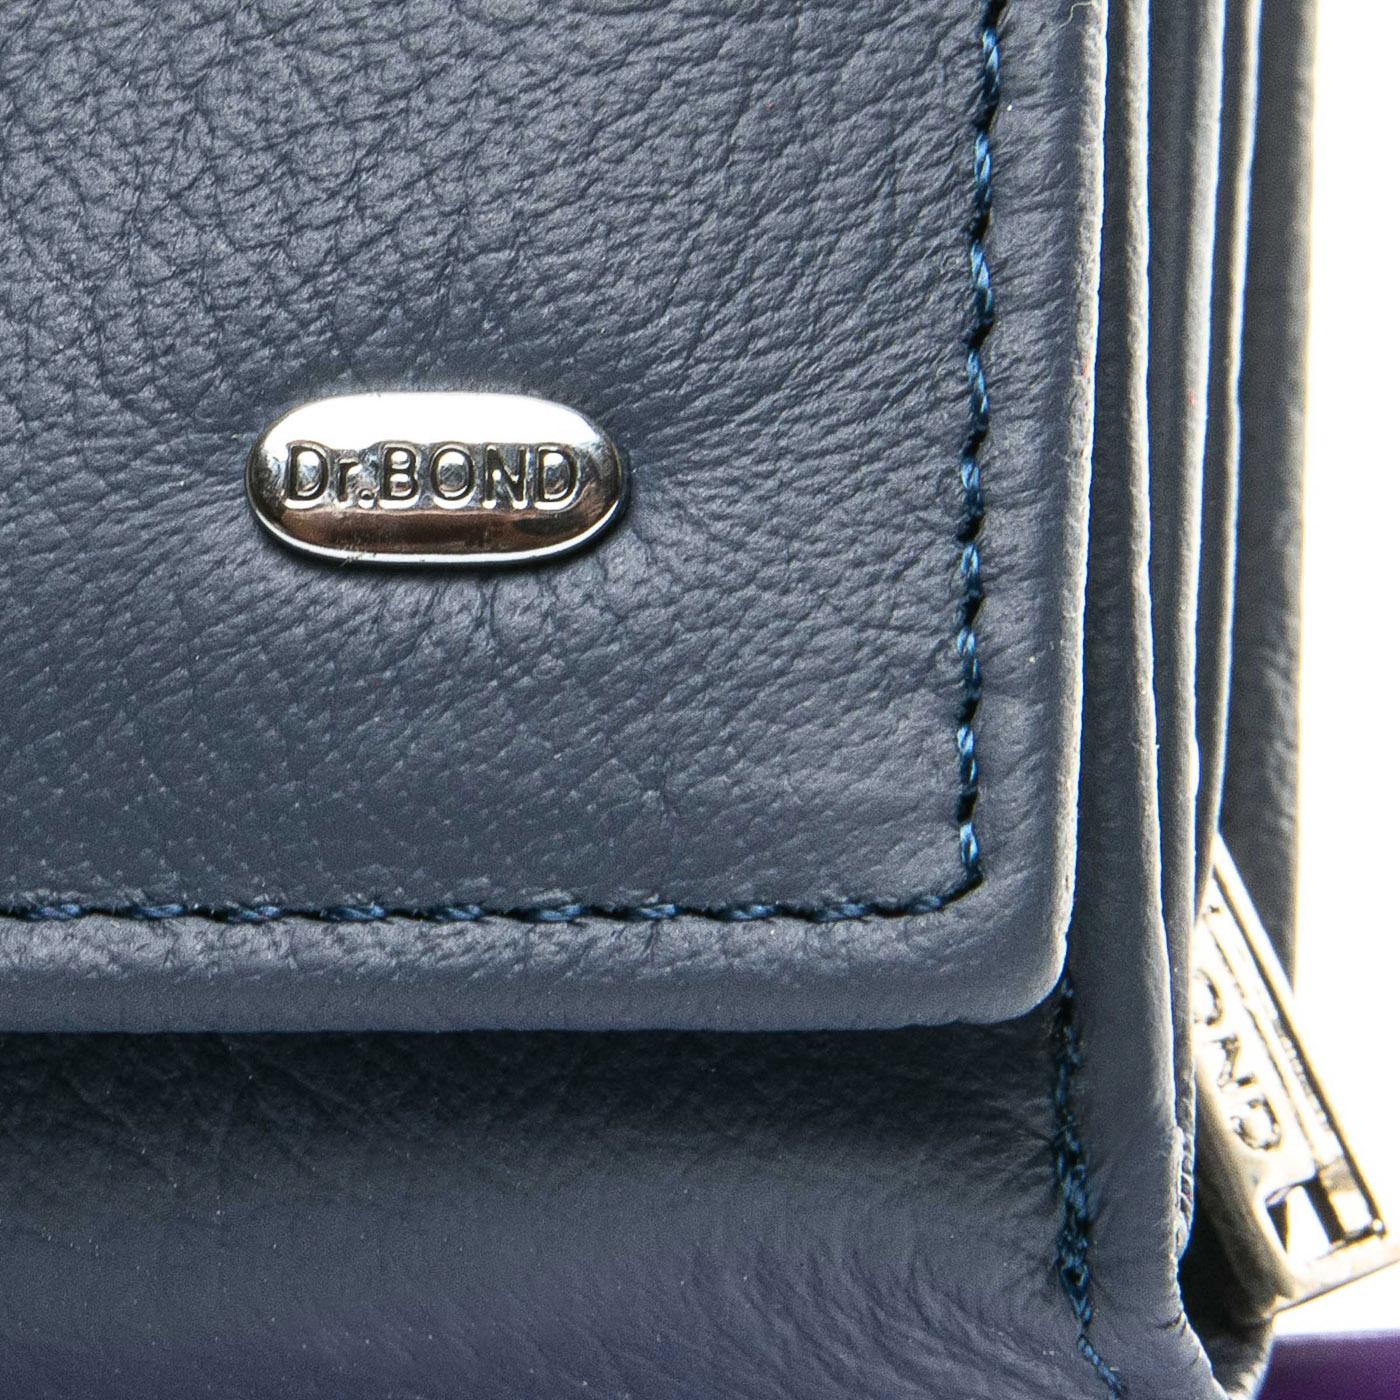 Кошелек Classic кожа DR. BOND WS-10 blue - фото 3